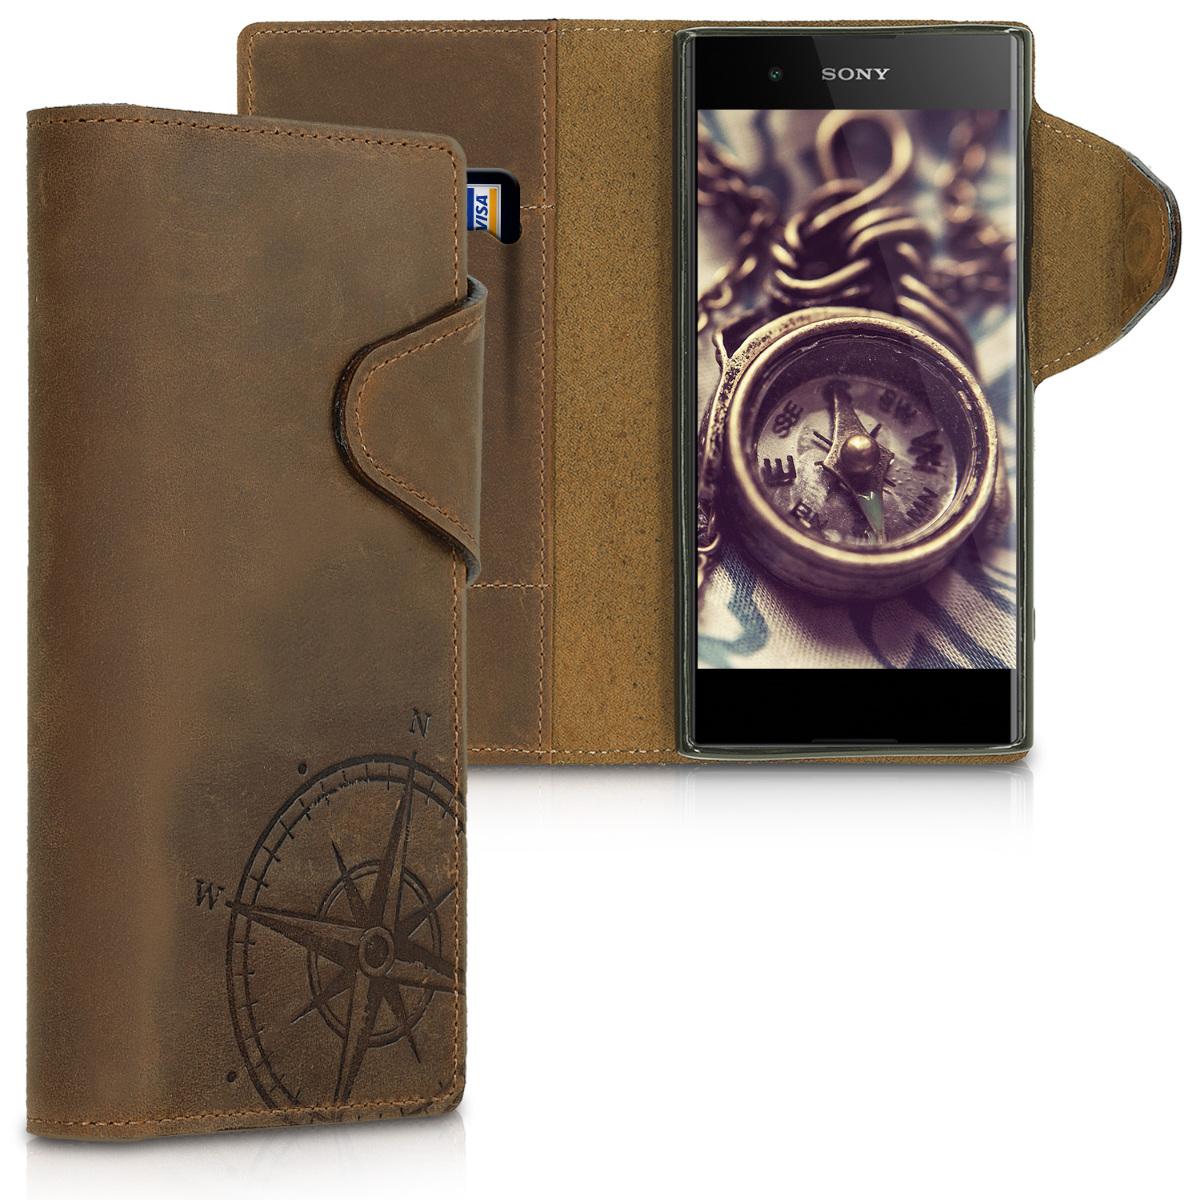 Kalibri Δερμάτινη Suede Θήκη - Πορτοφόλι Sony Xperia XA1 Plus - Brown Compass (46475.01)